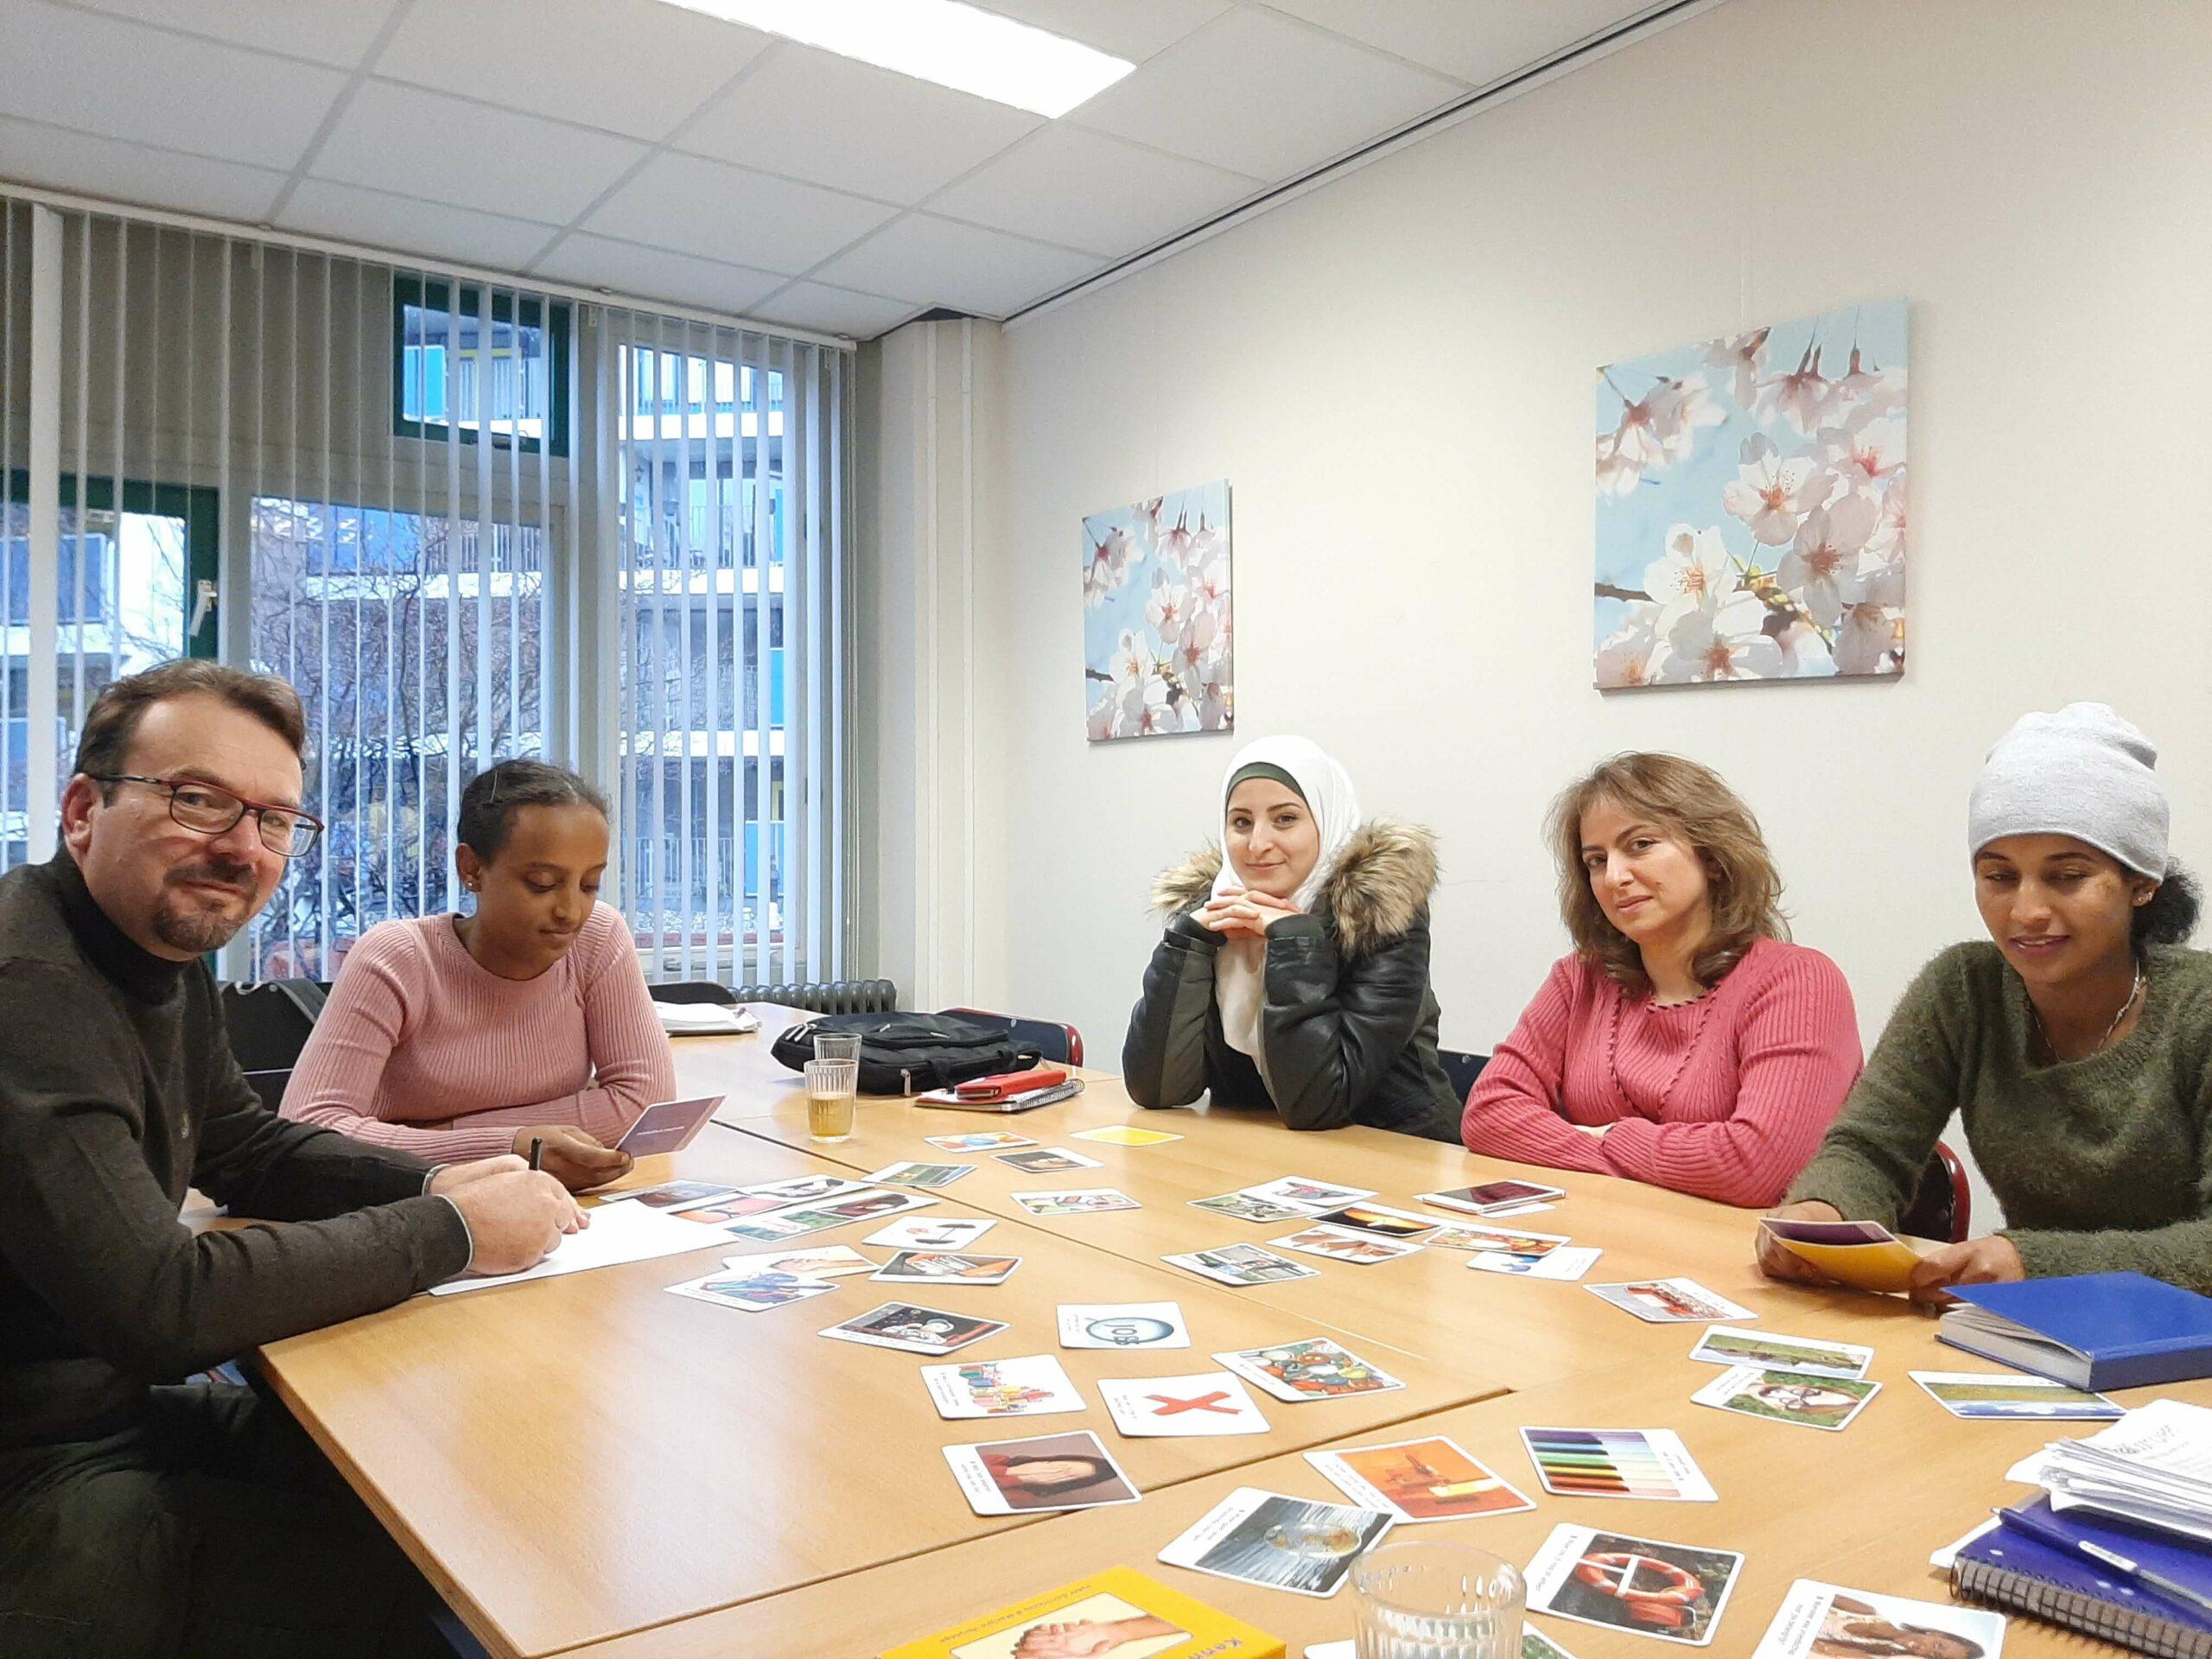 Beginner Dutch course for expats - Active Dutch